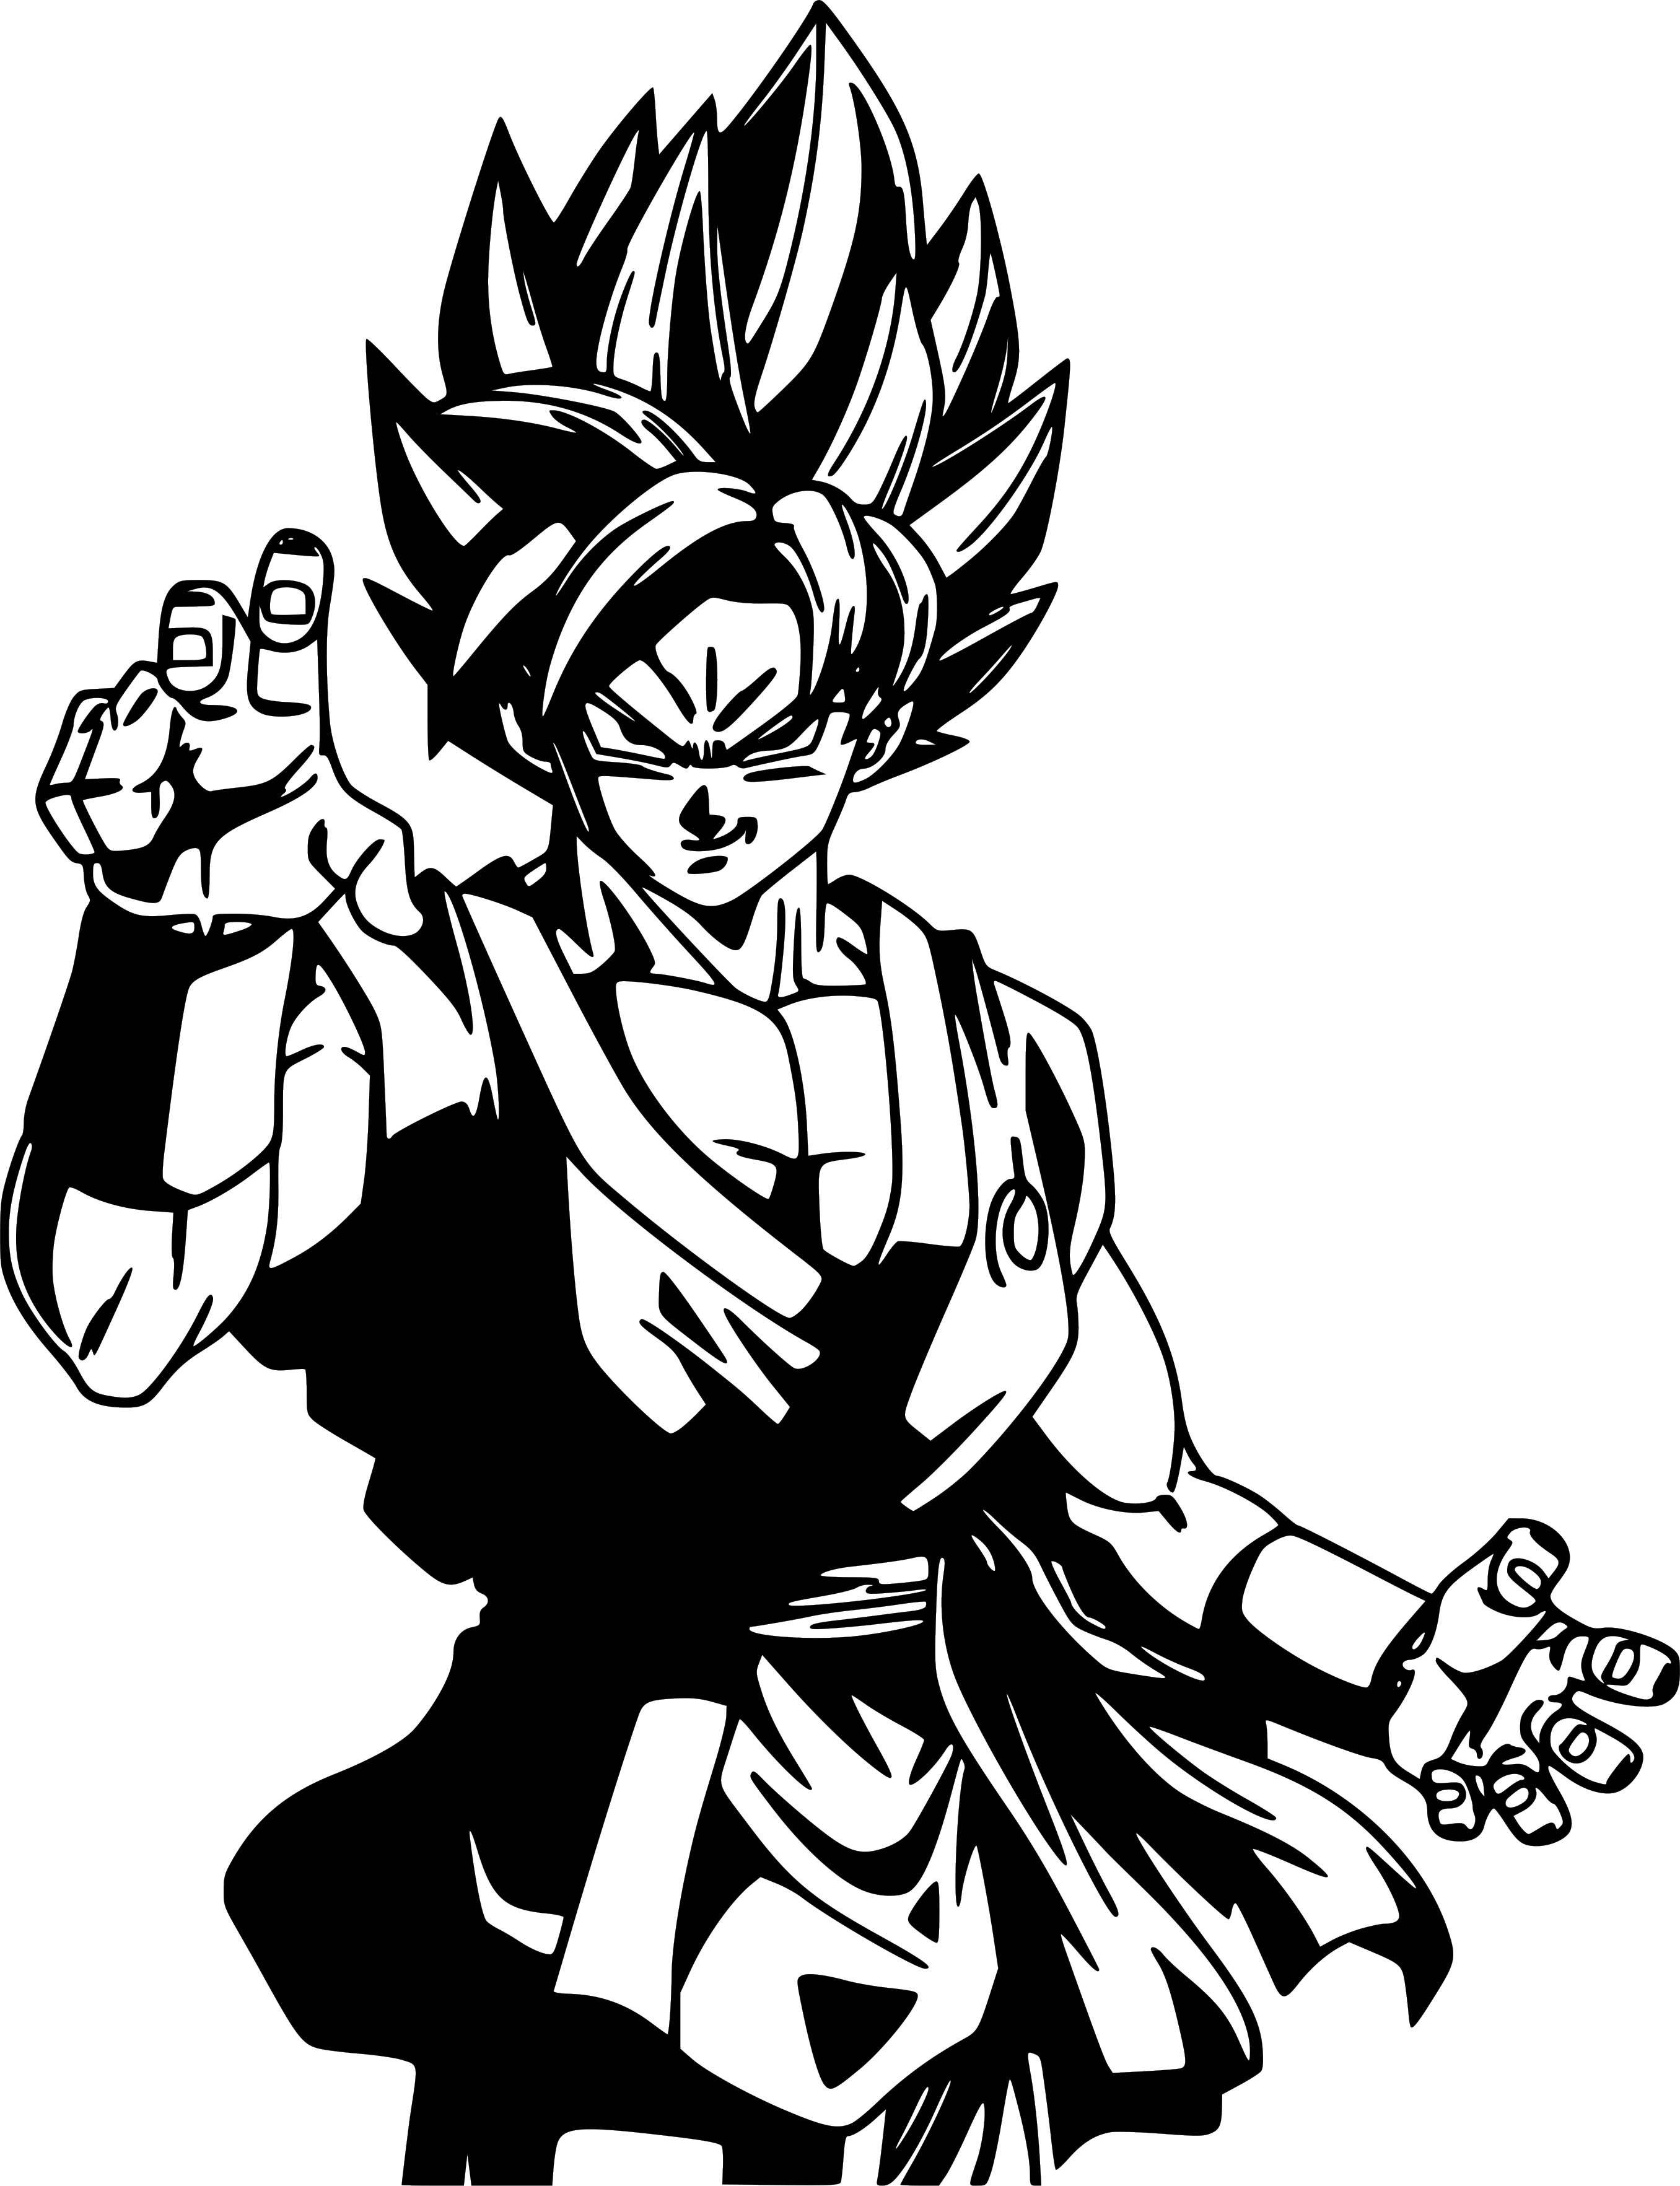 Goku super saiyan dragon ball z vinyl sticker decal